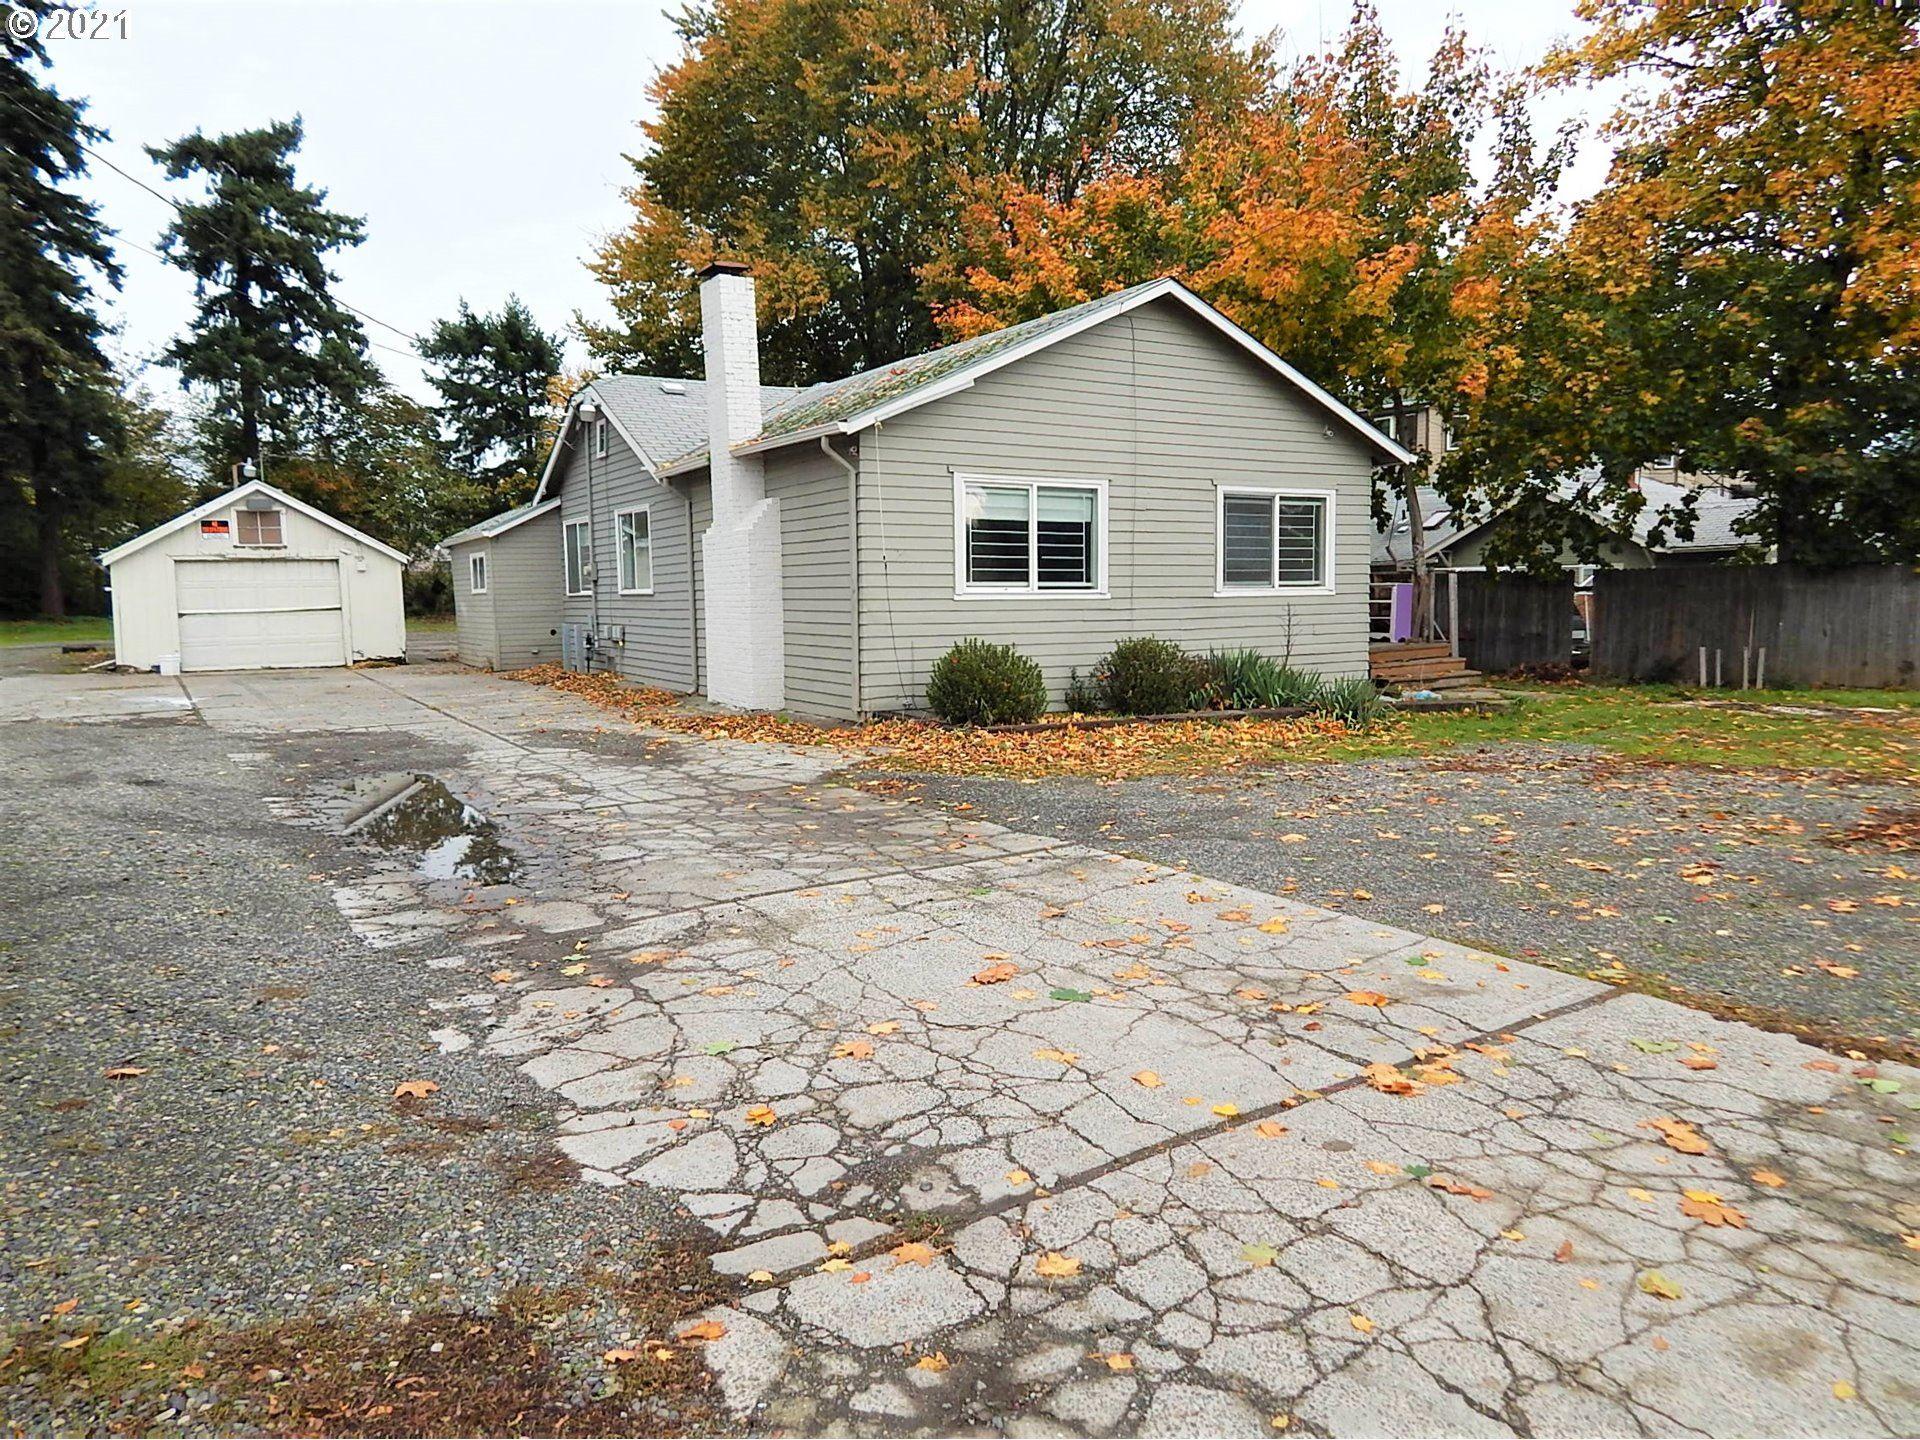 17031 SE STARK ST, Portland, OR 97233 - MLS#: 21134050